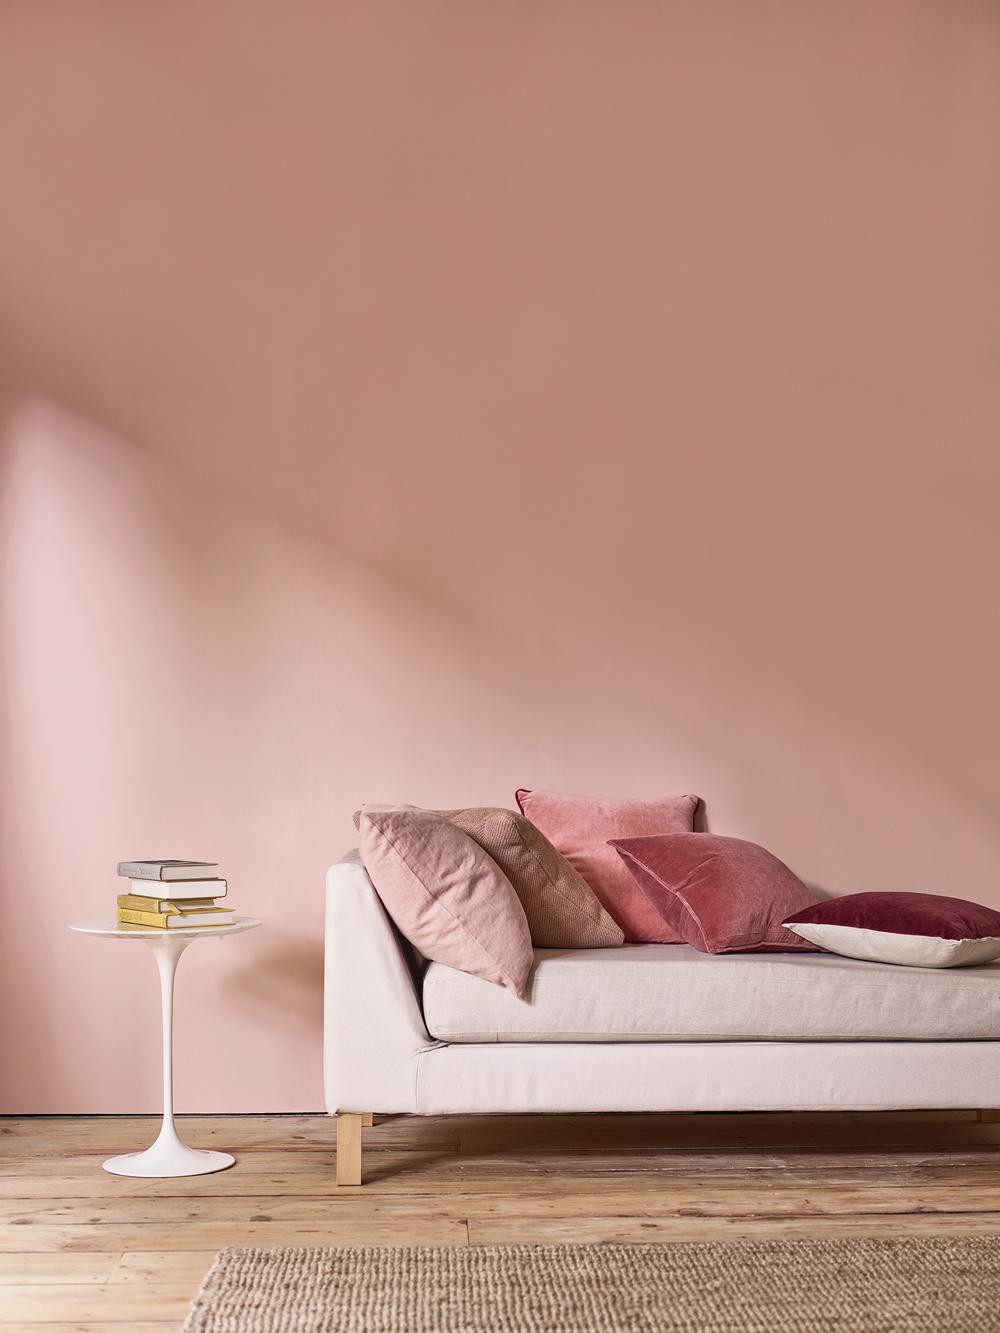 Paint colour inspiration: 31 of the best wall paint colours